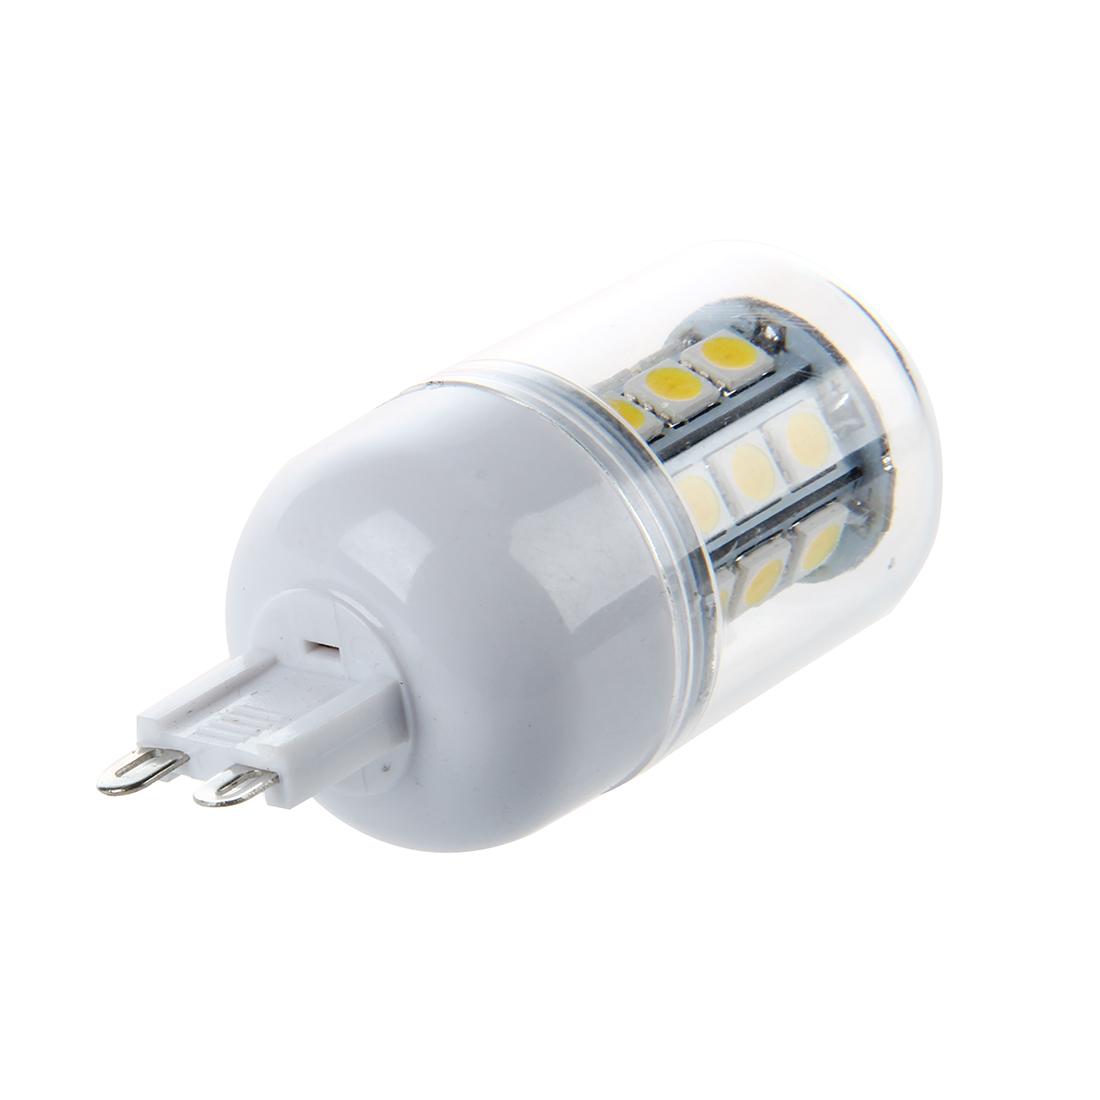 g9 warmweiss 27 smd led scheinwerfer lampen birne 5w k9p6 ebay. Black Bedroom Furniture Sets. Home Design Ideas